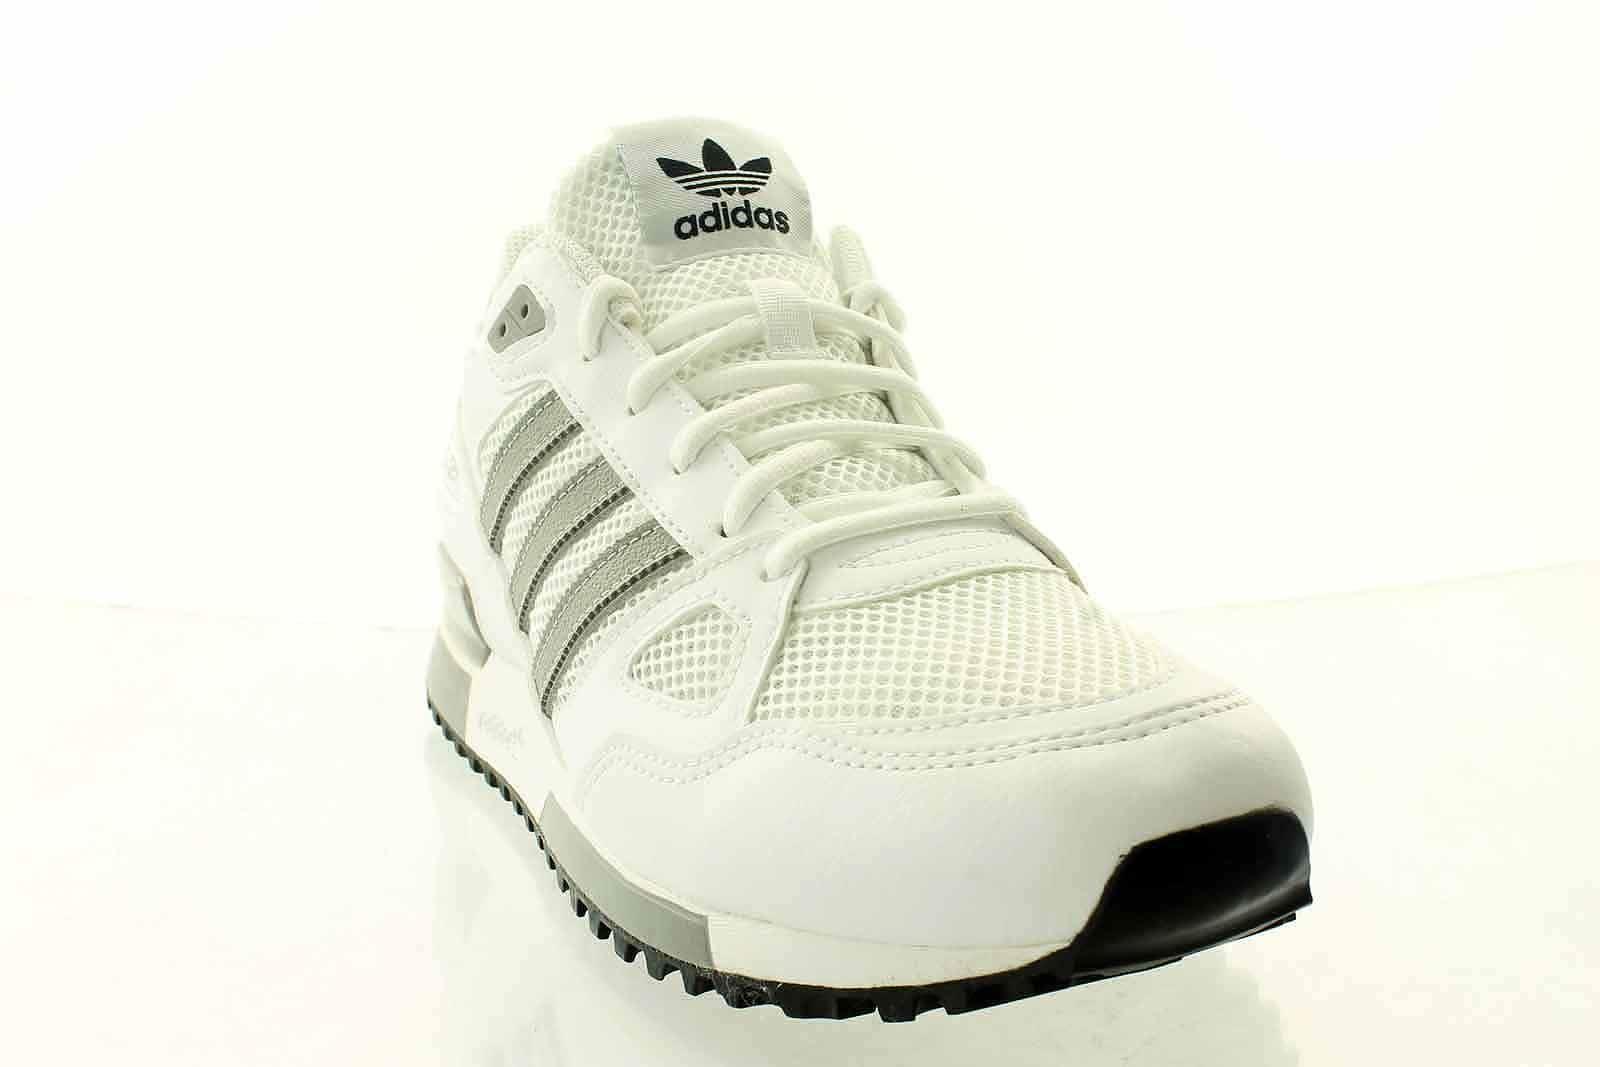 adidas-ZX-750-Mens-Trainers-Originals-UK-3-